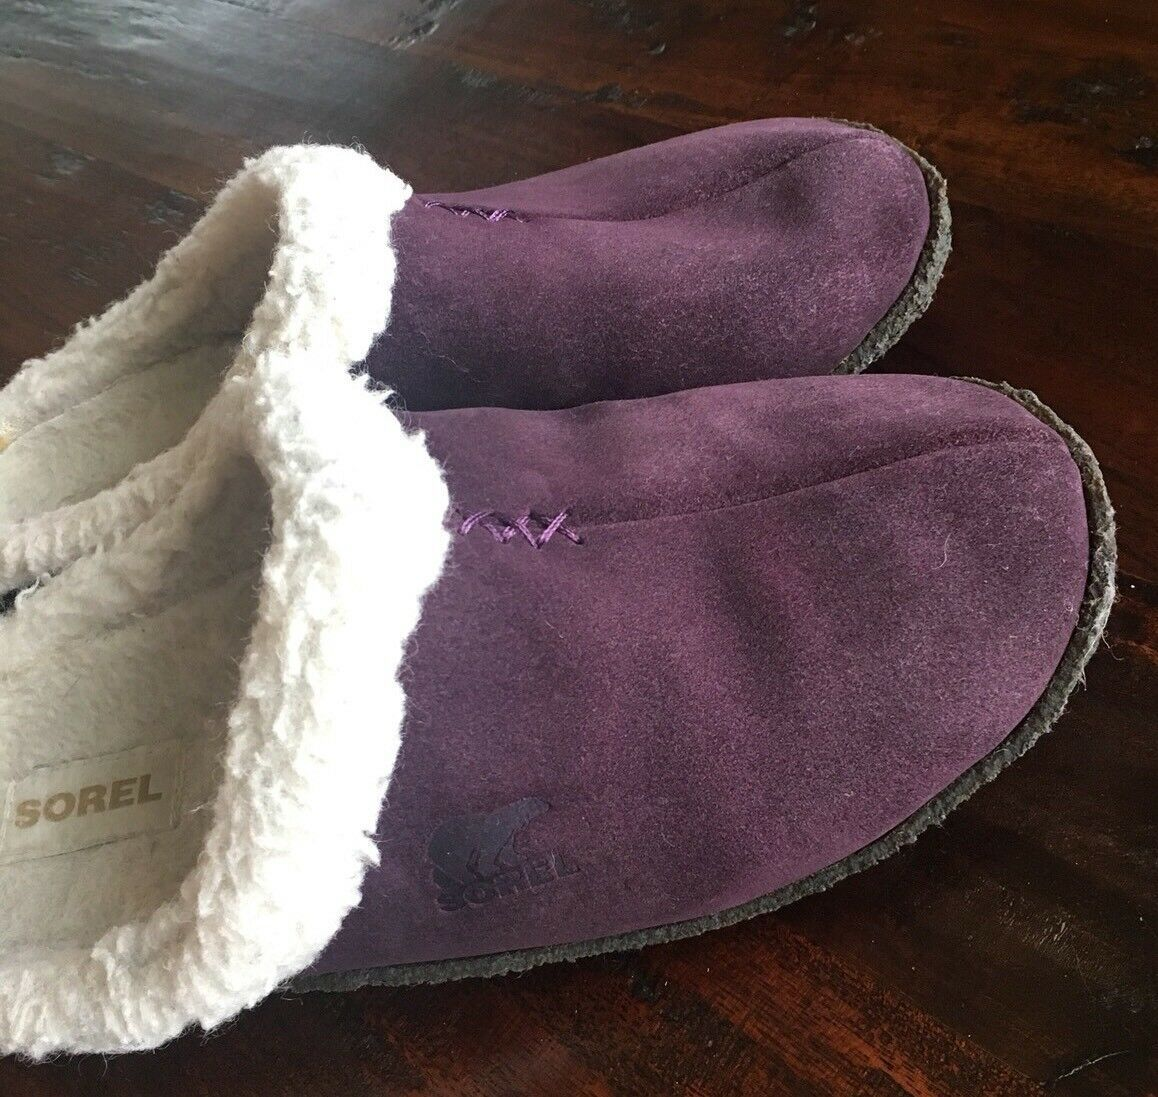 SOREL 9381 Womens Nakiska LILAC Purple Suede Clog Slippers Shoes 6 M #176 image 5